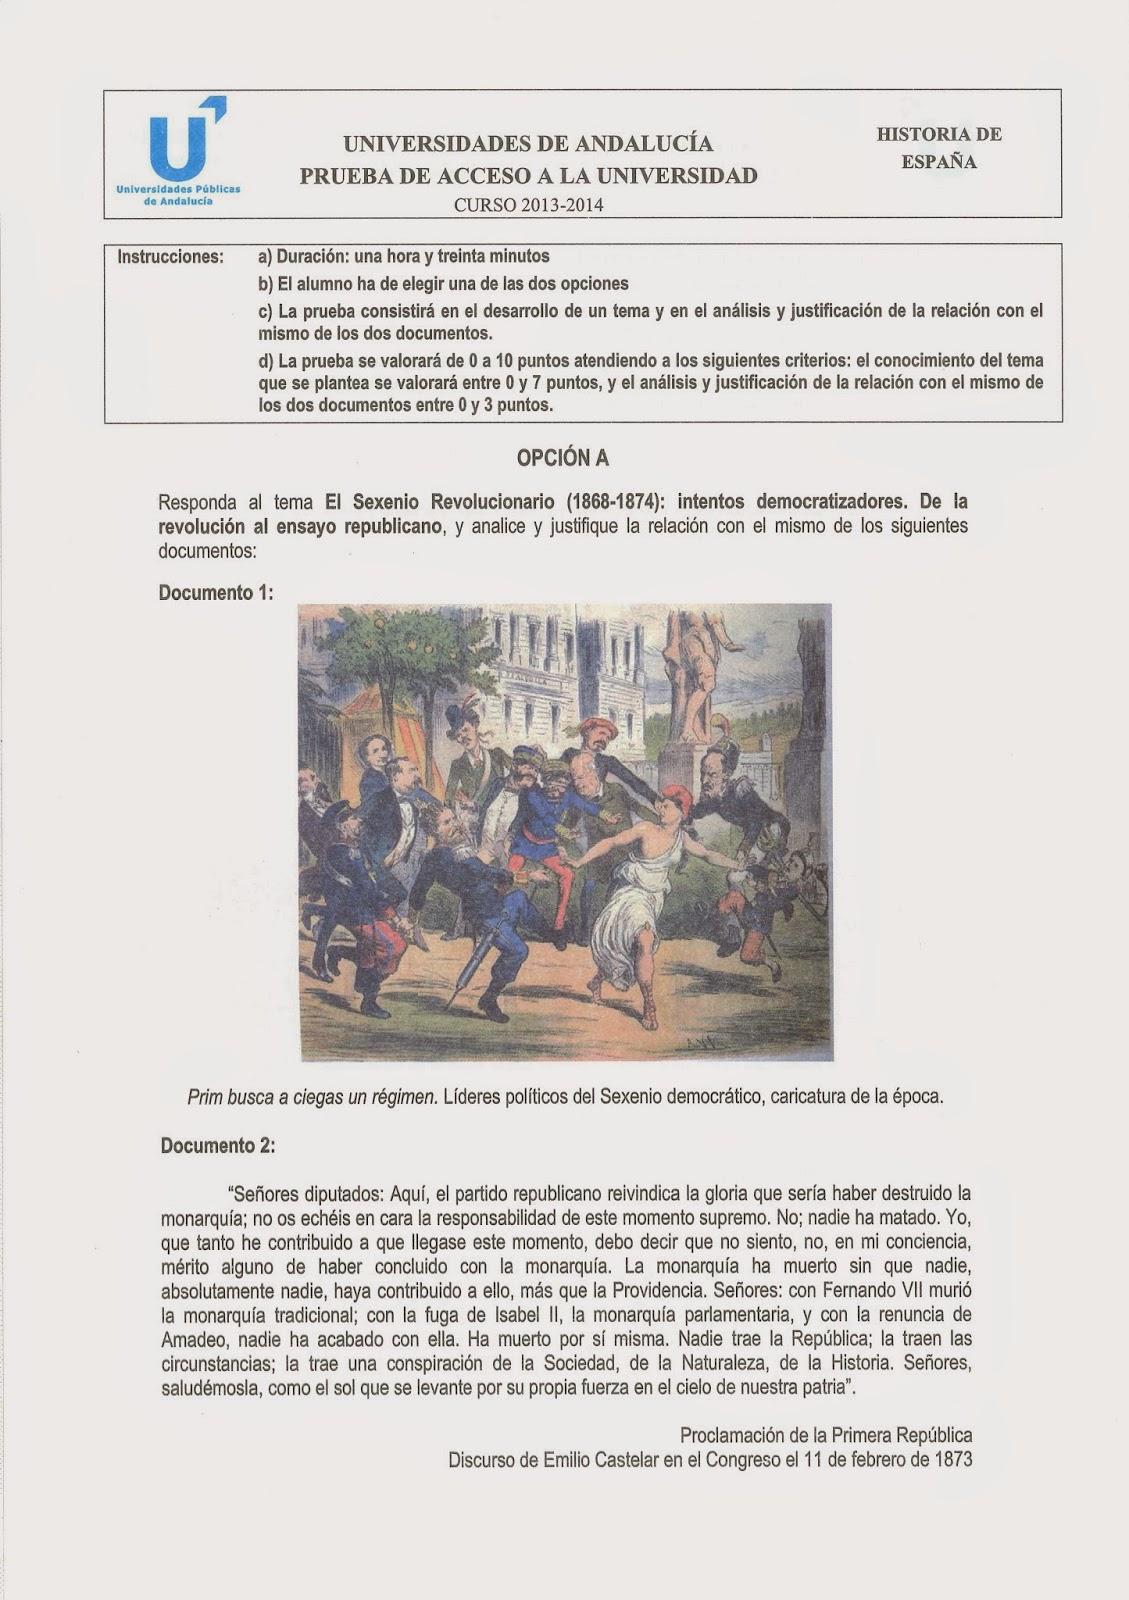 PAU Historia de España junio 2014 Andalucía Opción A Selectividad